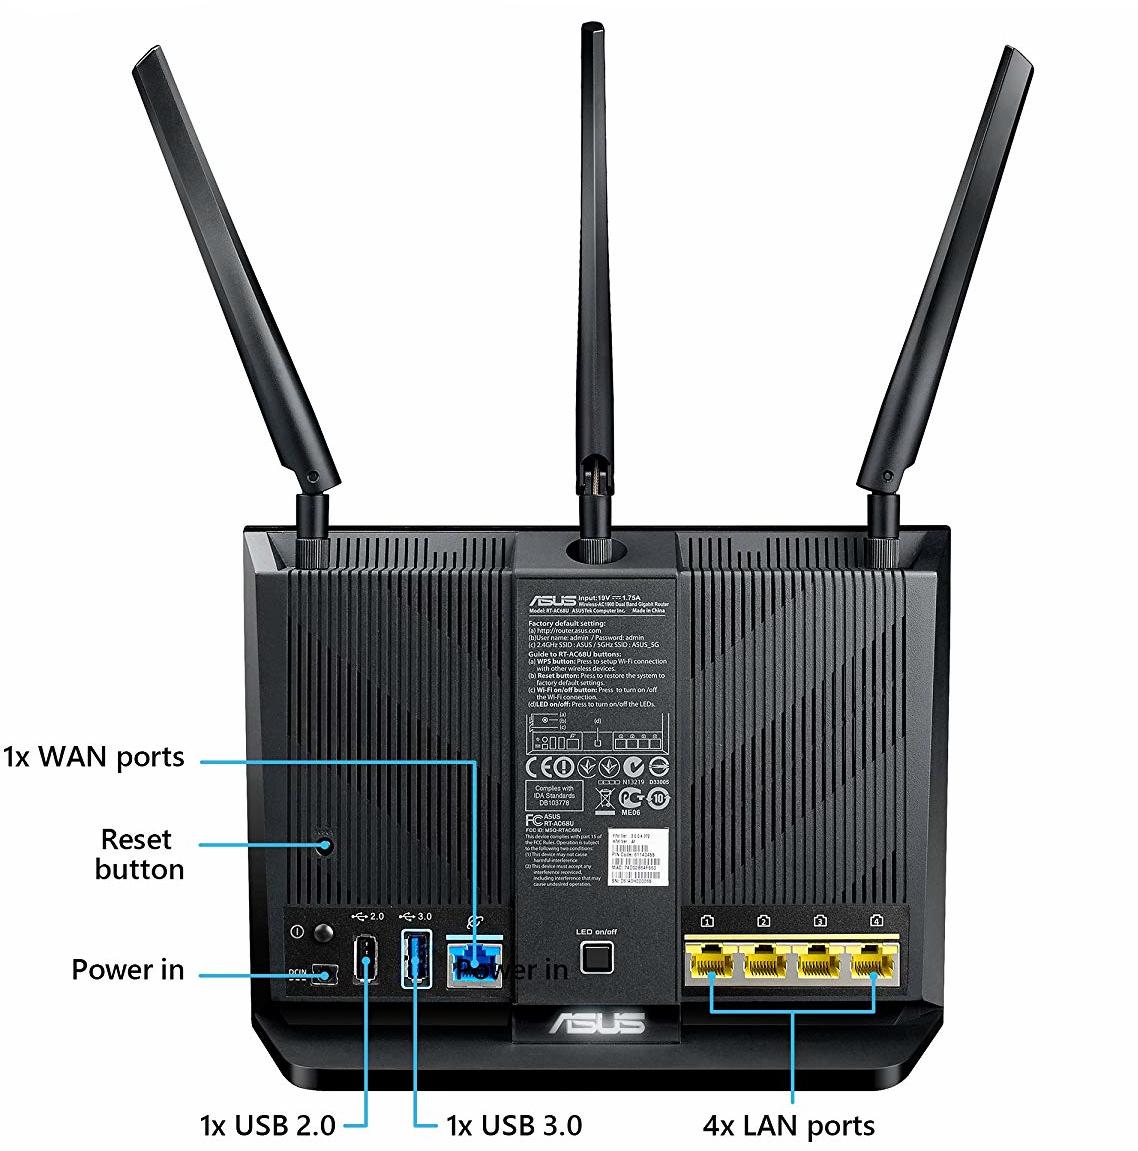 ASUS RT-AC68U AC1900 Dual Band Gigabit Wi-Fi Router image